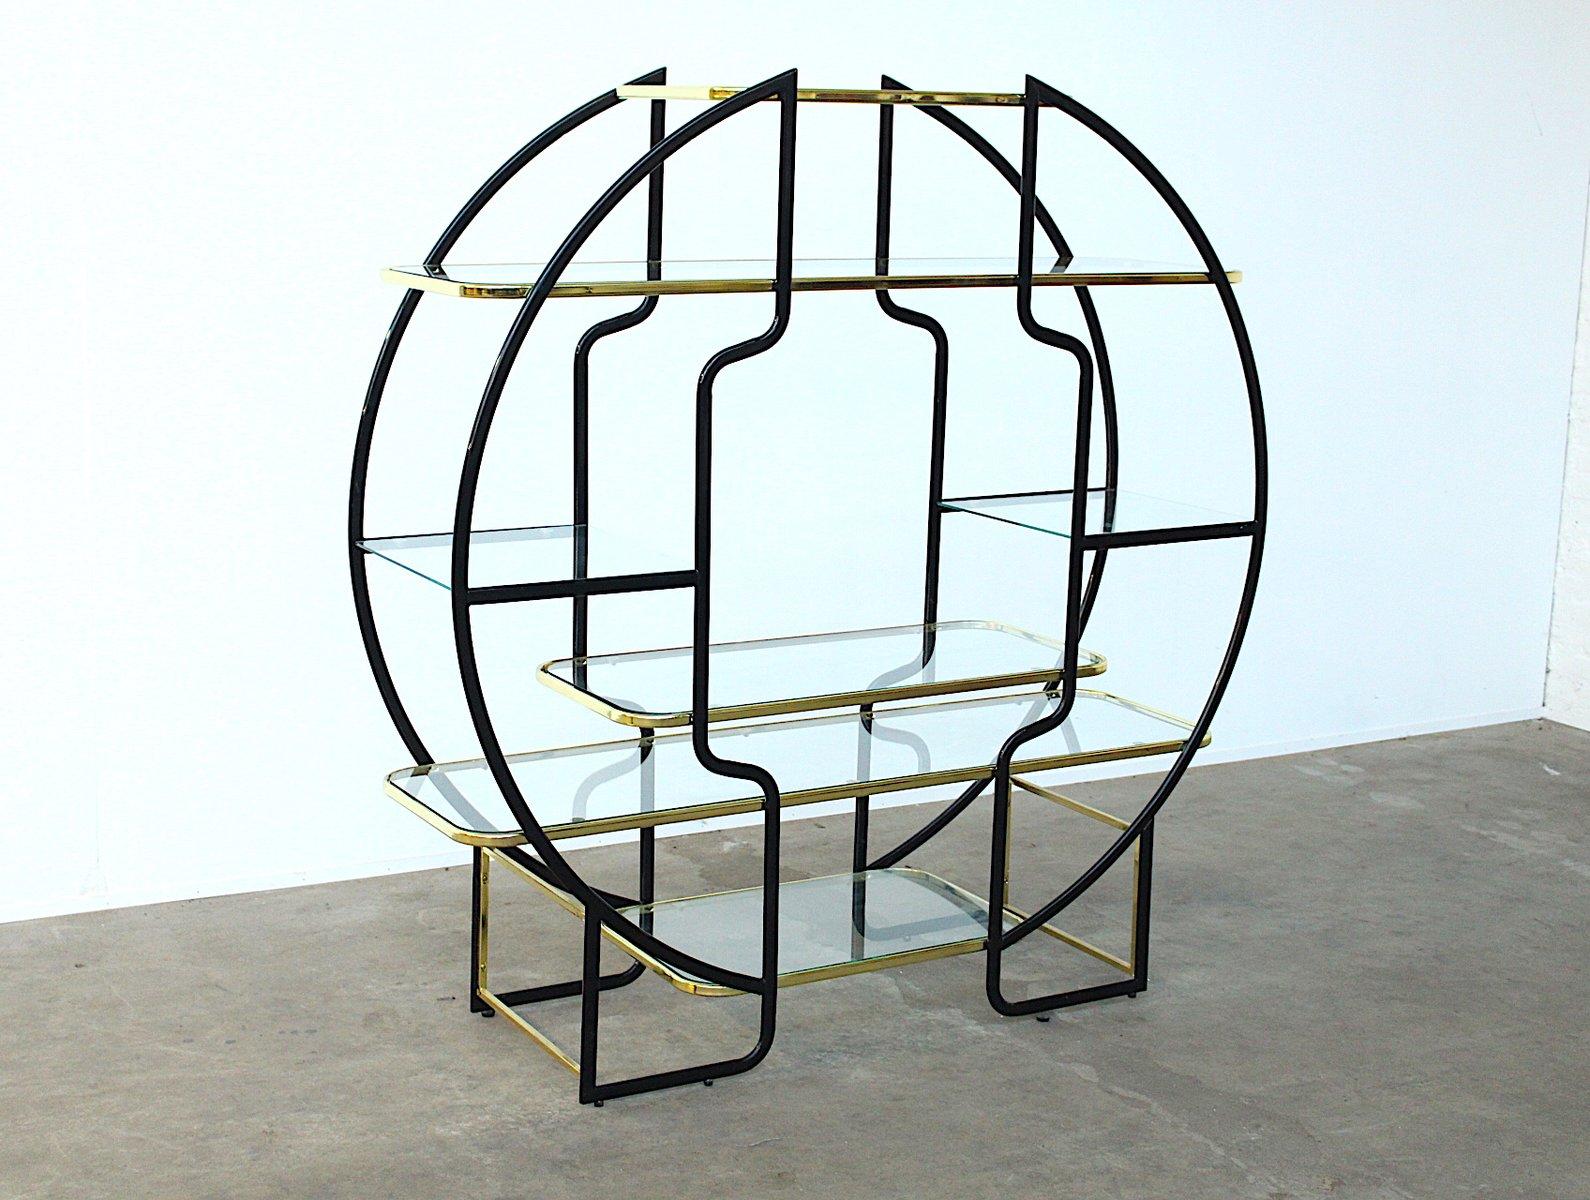 gro es rundes hollywood regency regal aus schwarzem metall messing 1970er bei pamono kaufen. Black Bedroom Furniture Sets. Home Design Ideas